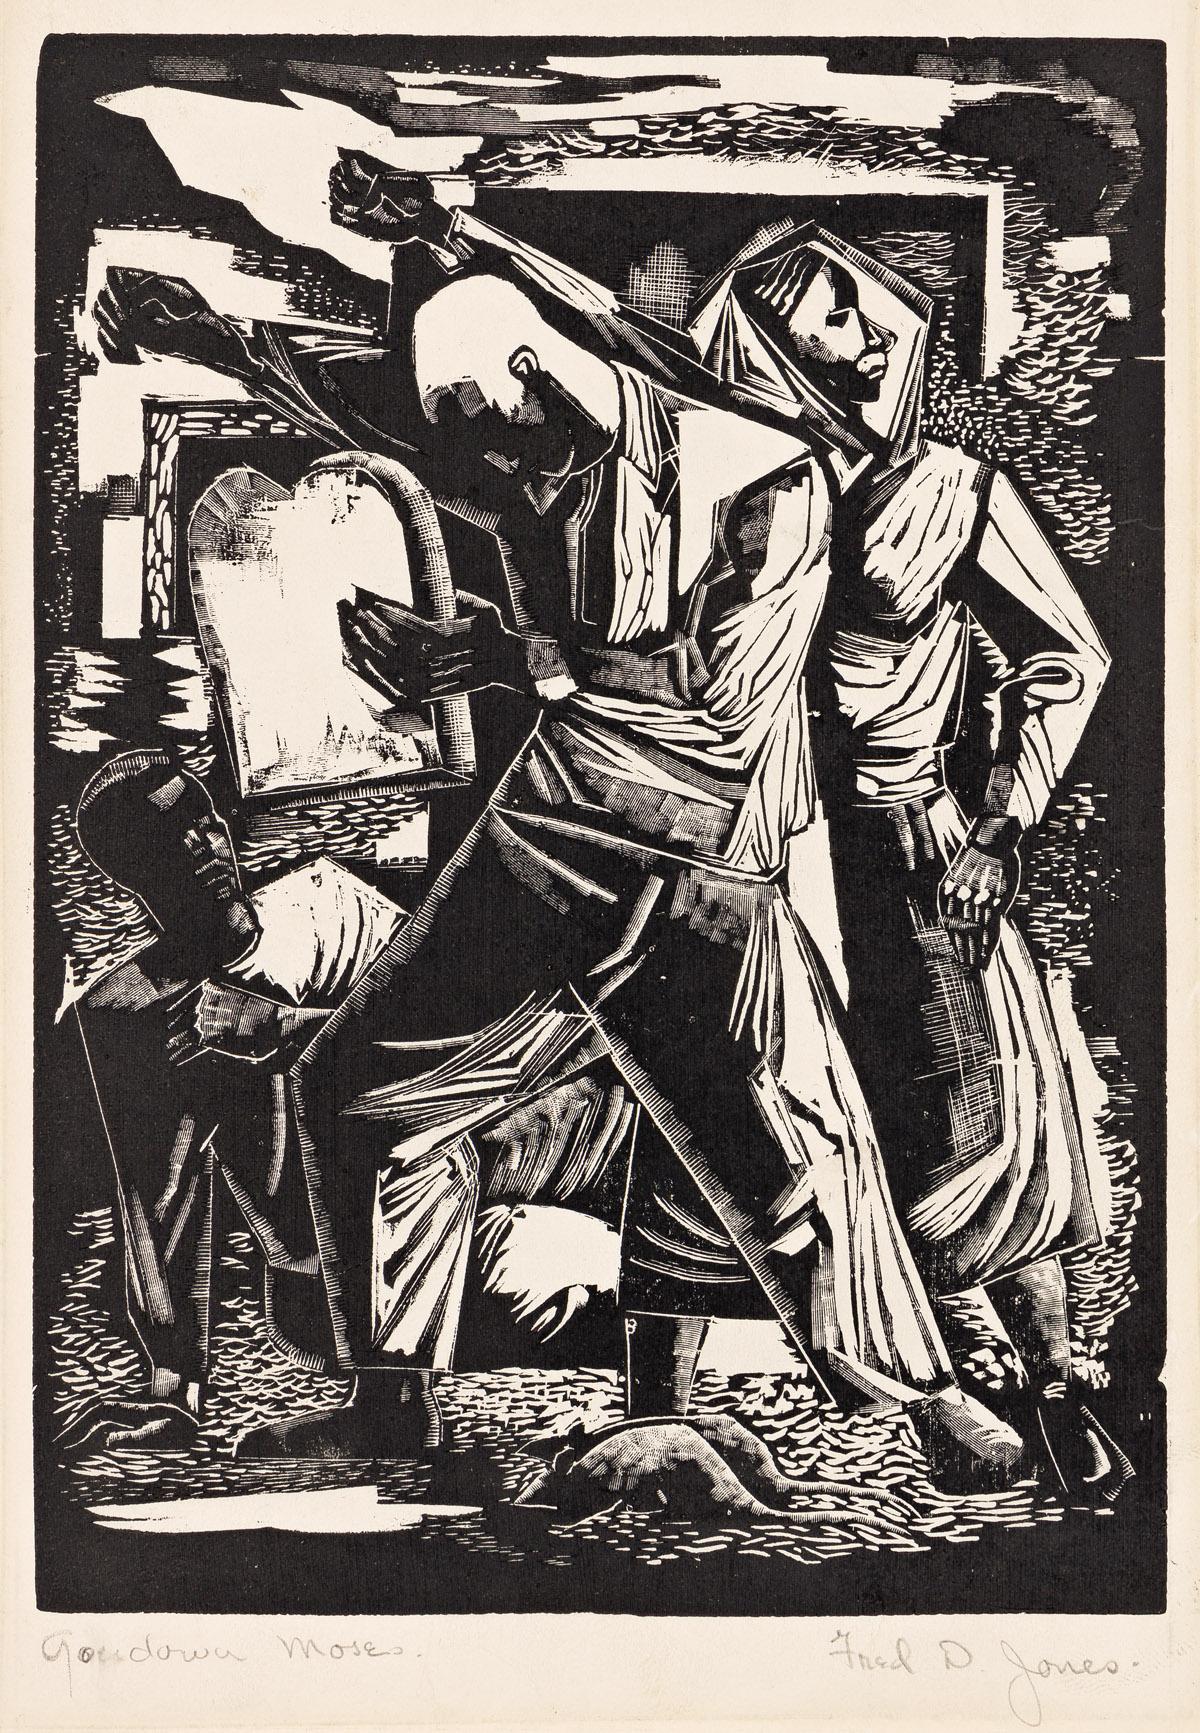 FREDERICK D. JONES (1914 - 2004) Go Down Moses.